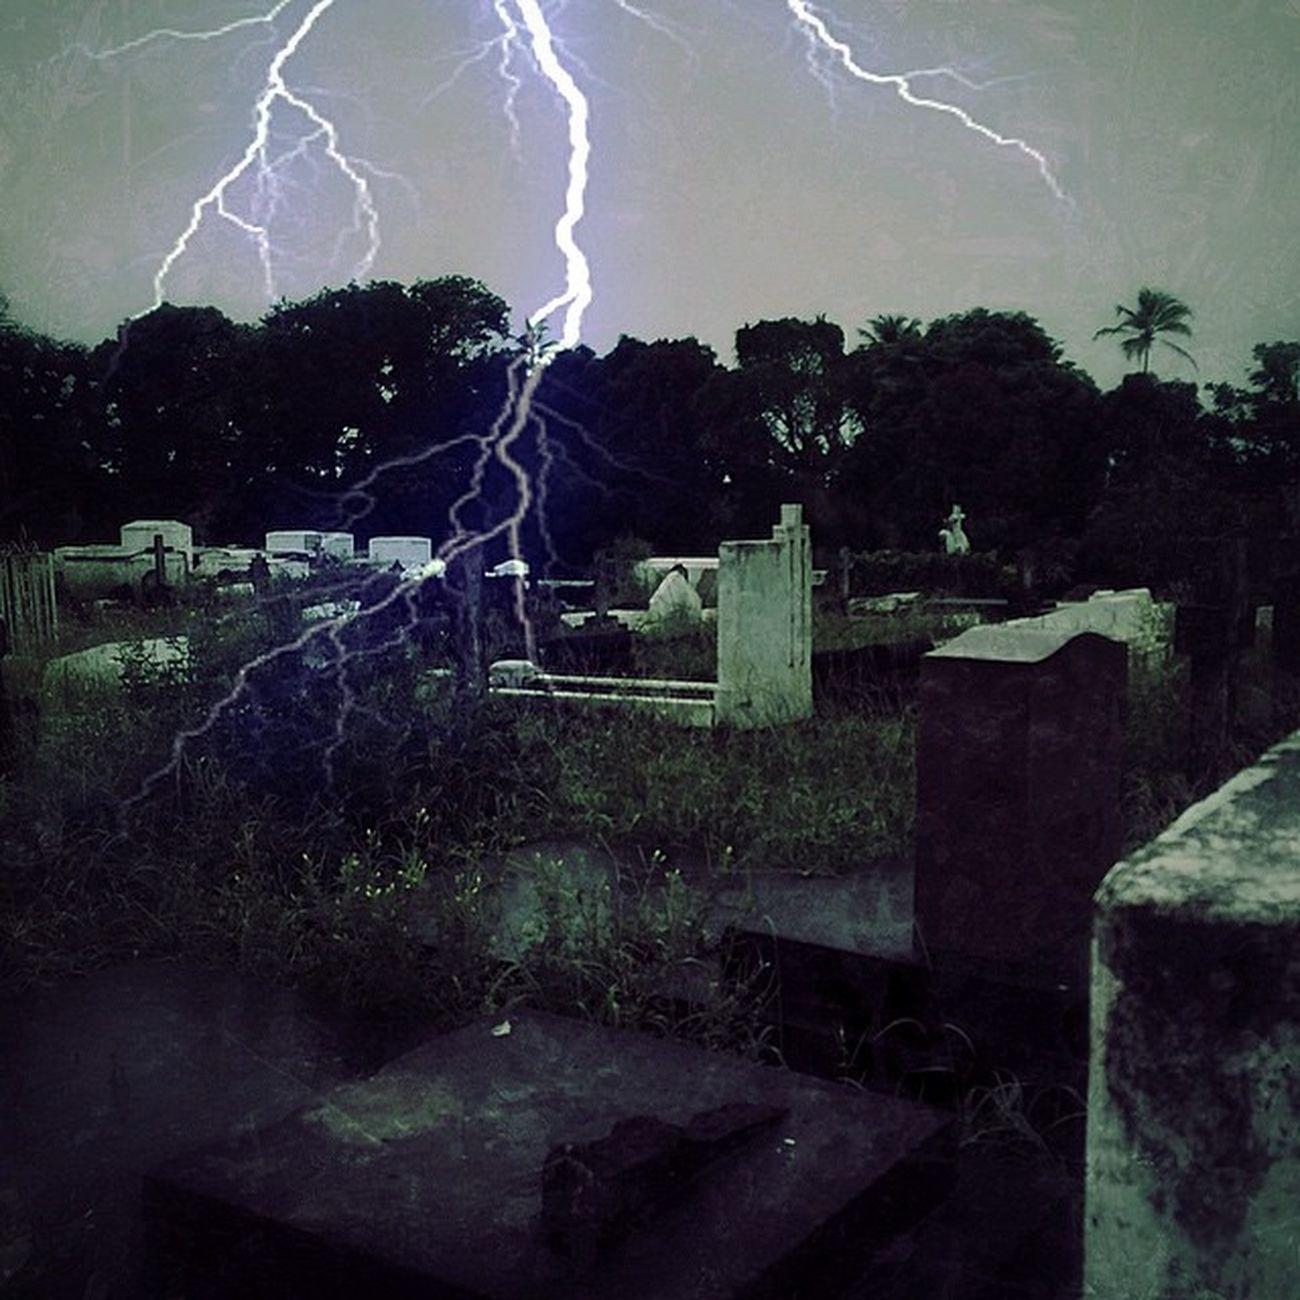 Graveyard Cemetery Grenada Spooky Lightning Caribbean_beautiful_landscapes Westindies_landscape Insta_noir Icu_puertorico Ig_martinique Ig_caribbean Shutterbug_collective Editgram Instagram